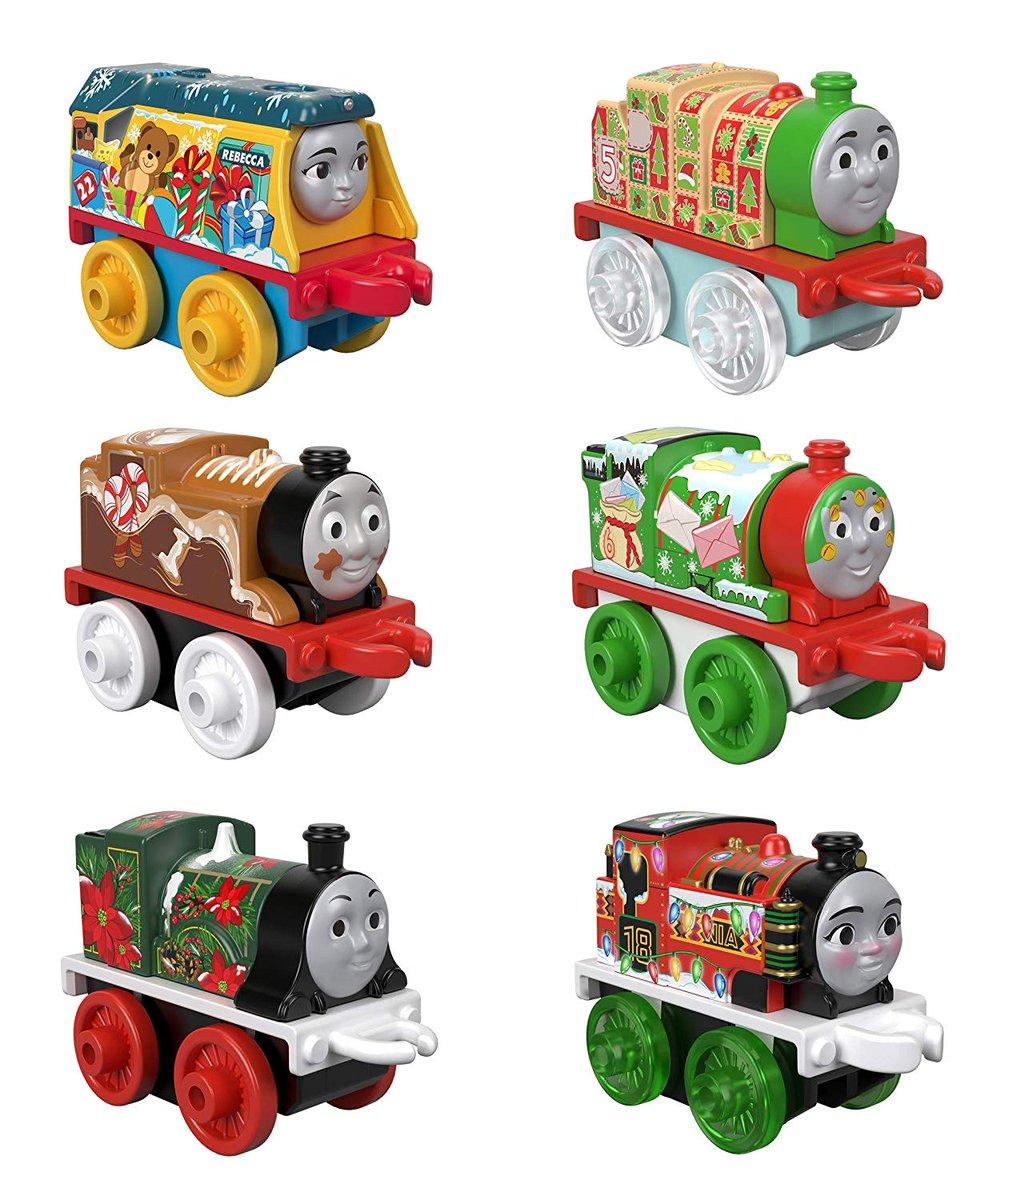 Fisher-Price Thomas & Friends Minis, Advent Calendar 2019Amazon USAでの取り扱いも開始したようですね、仮注文で一つ4000円程度で購入できますね。